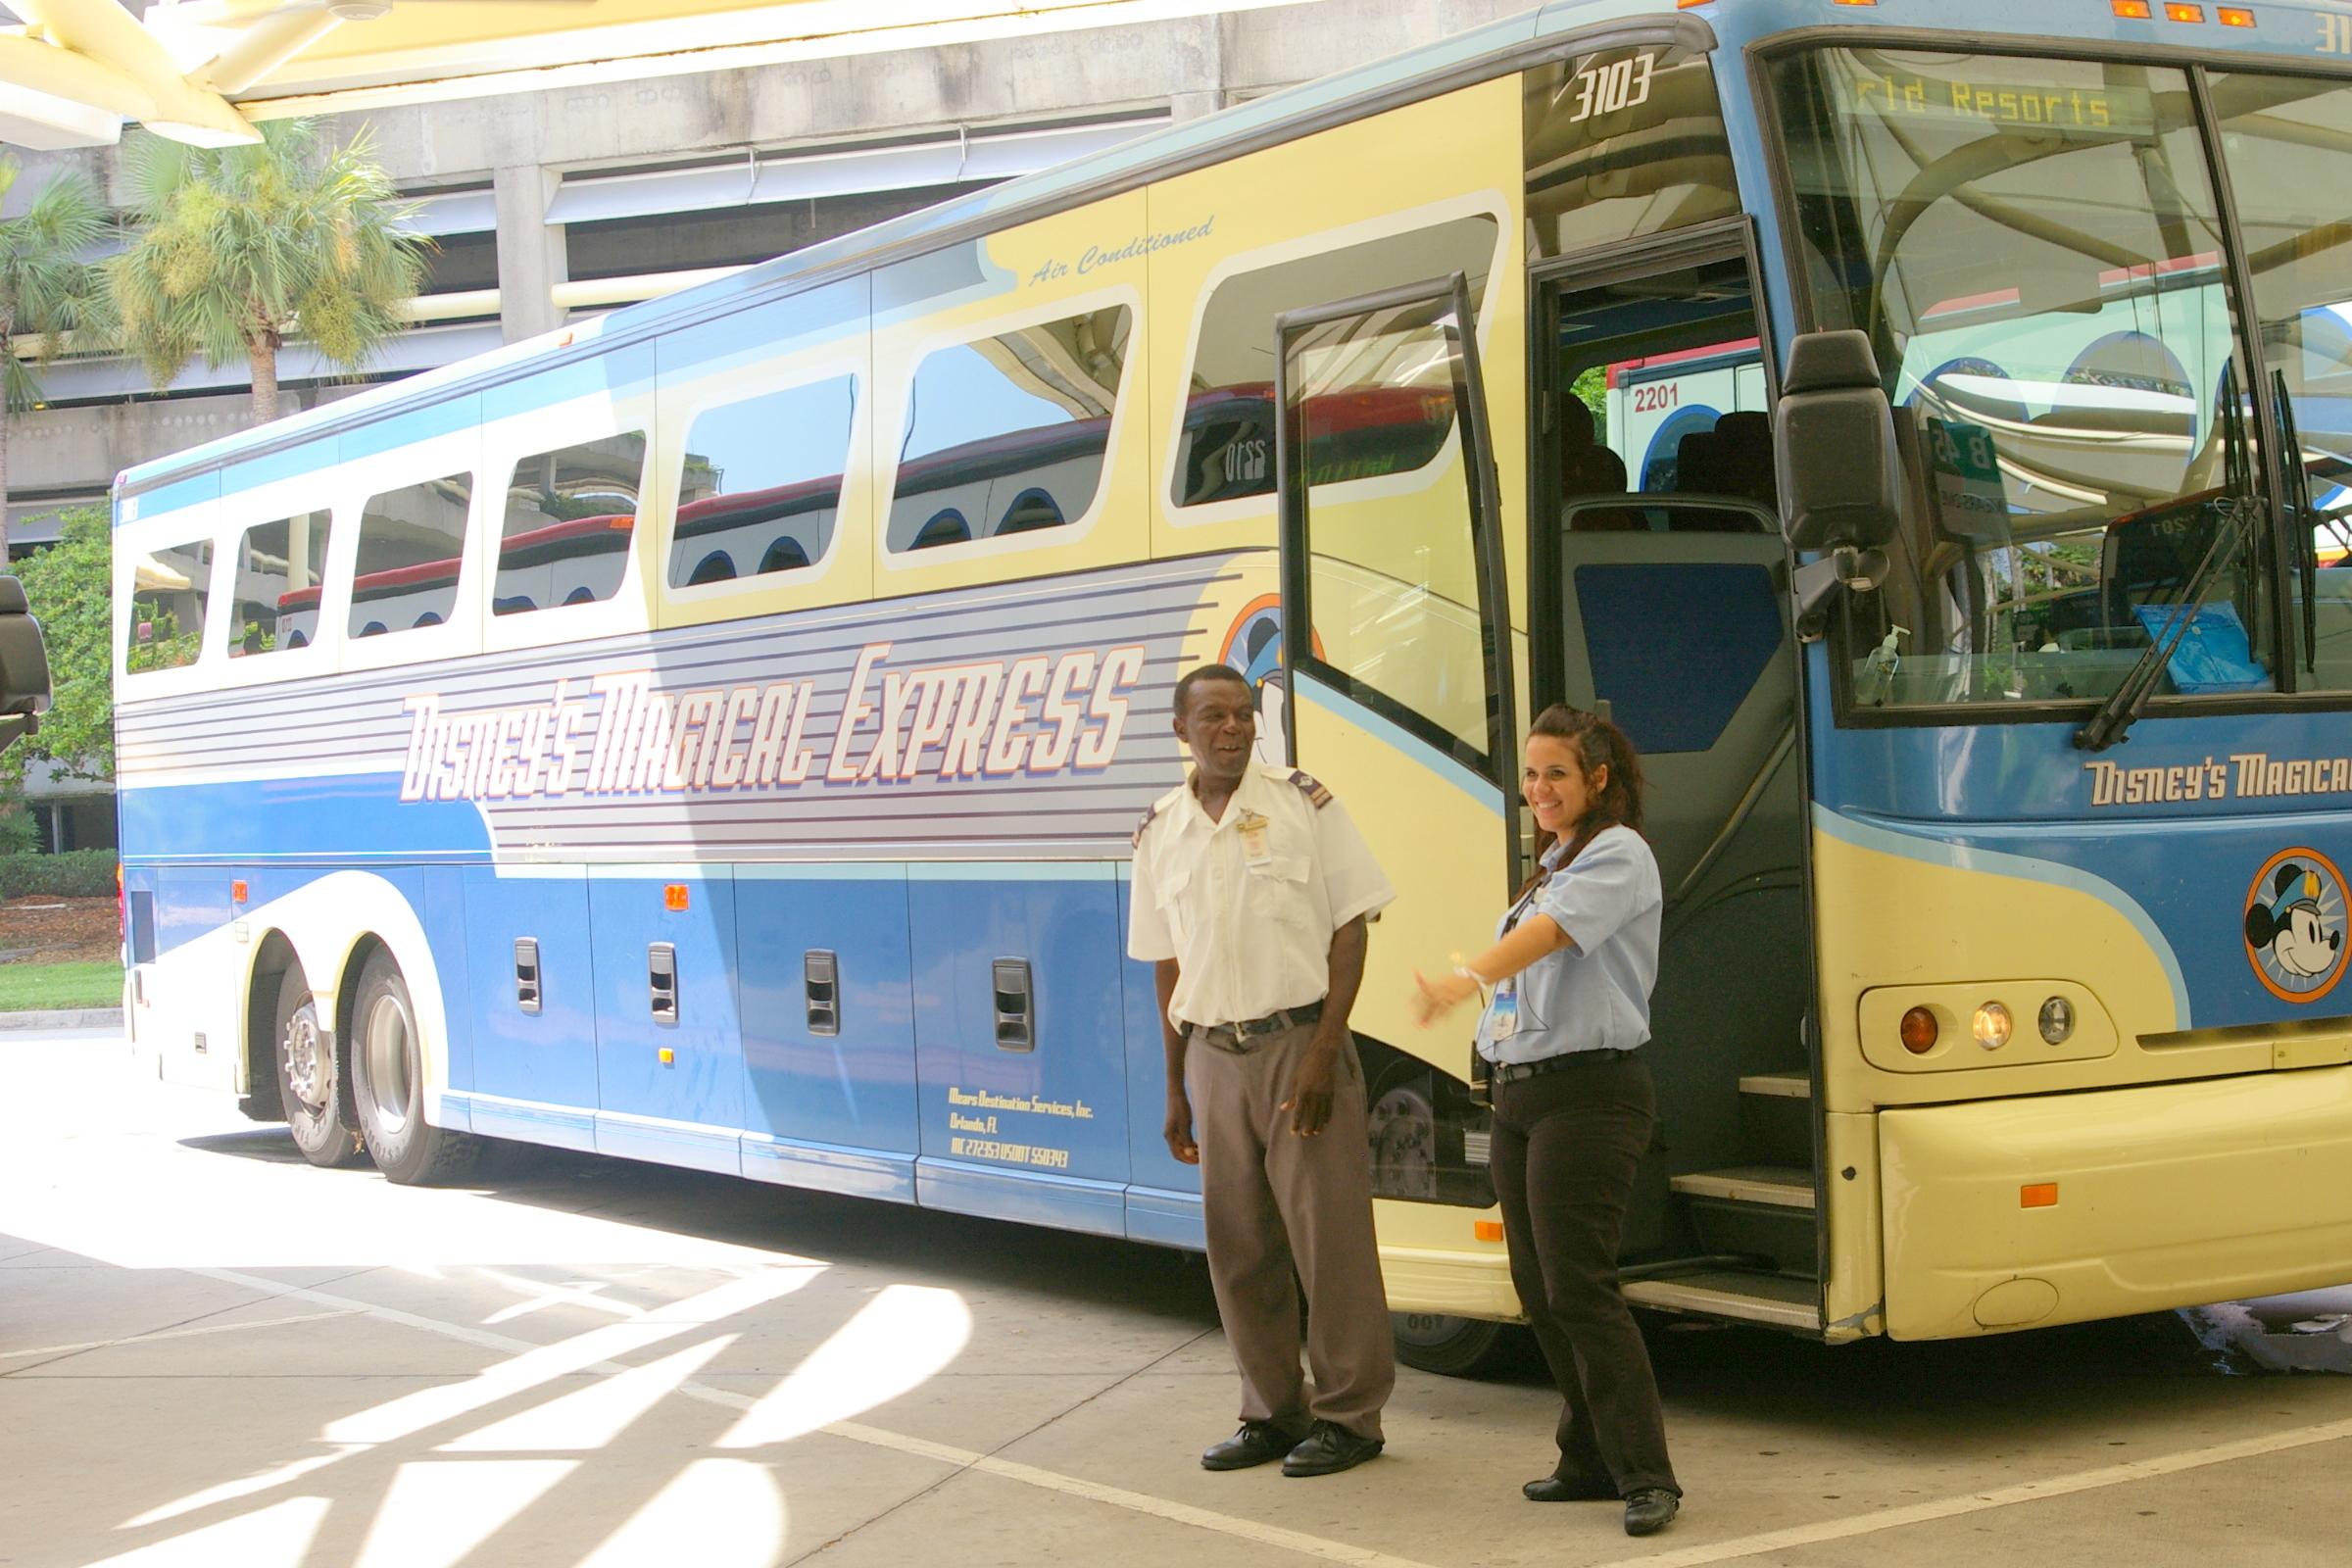 Disney S Magical Express 171 Sheila Gallant Halloran